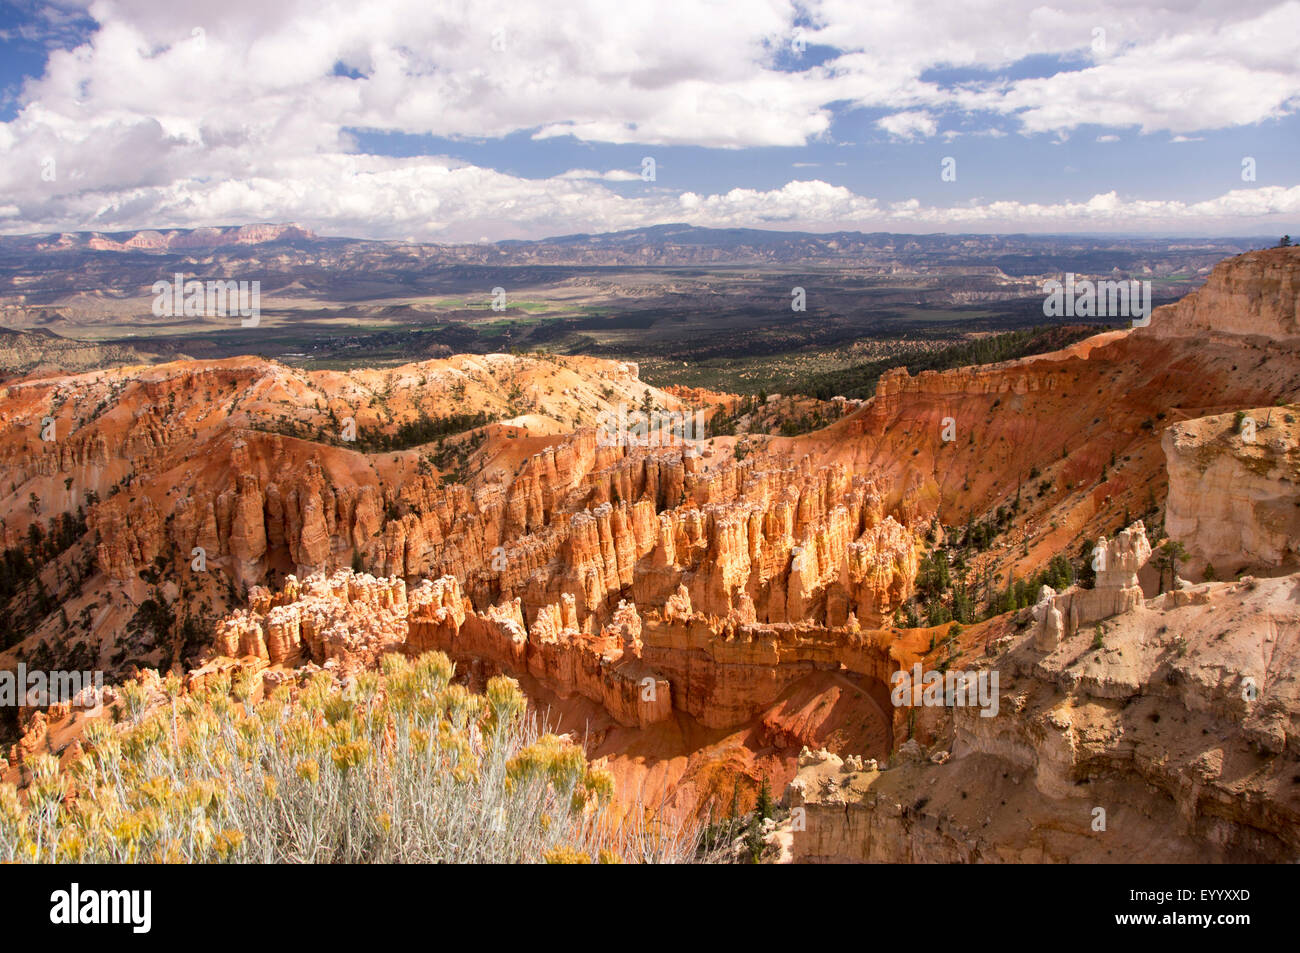 Amphitheatre of Bryce Canyon, USA, Utah, Bryce Canyon National Park - Stock Image